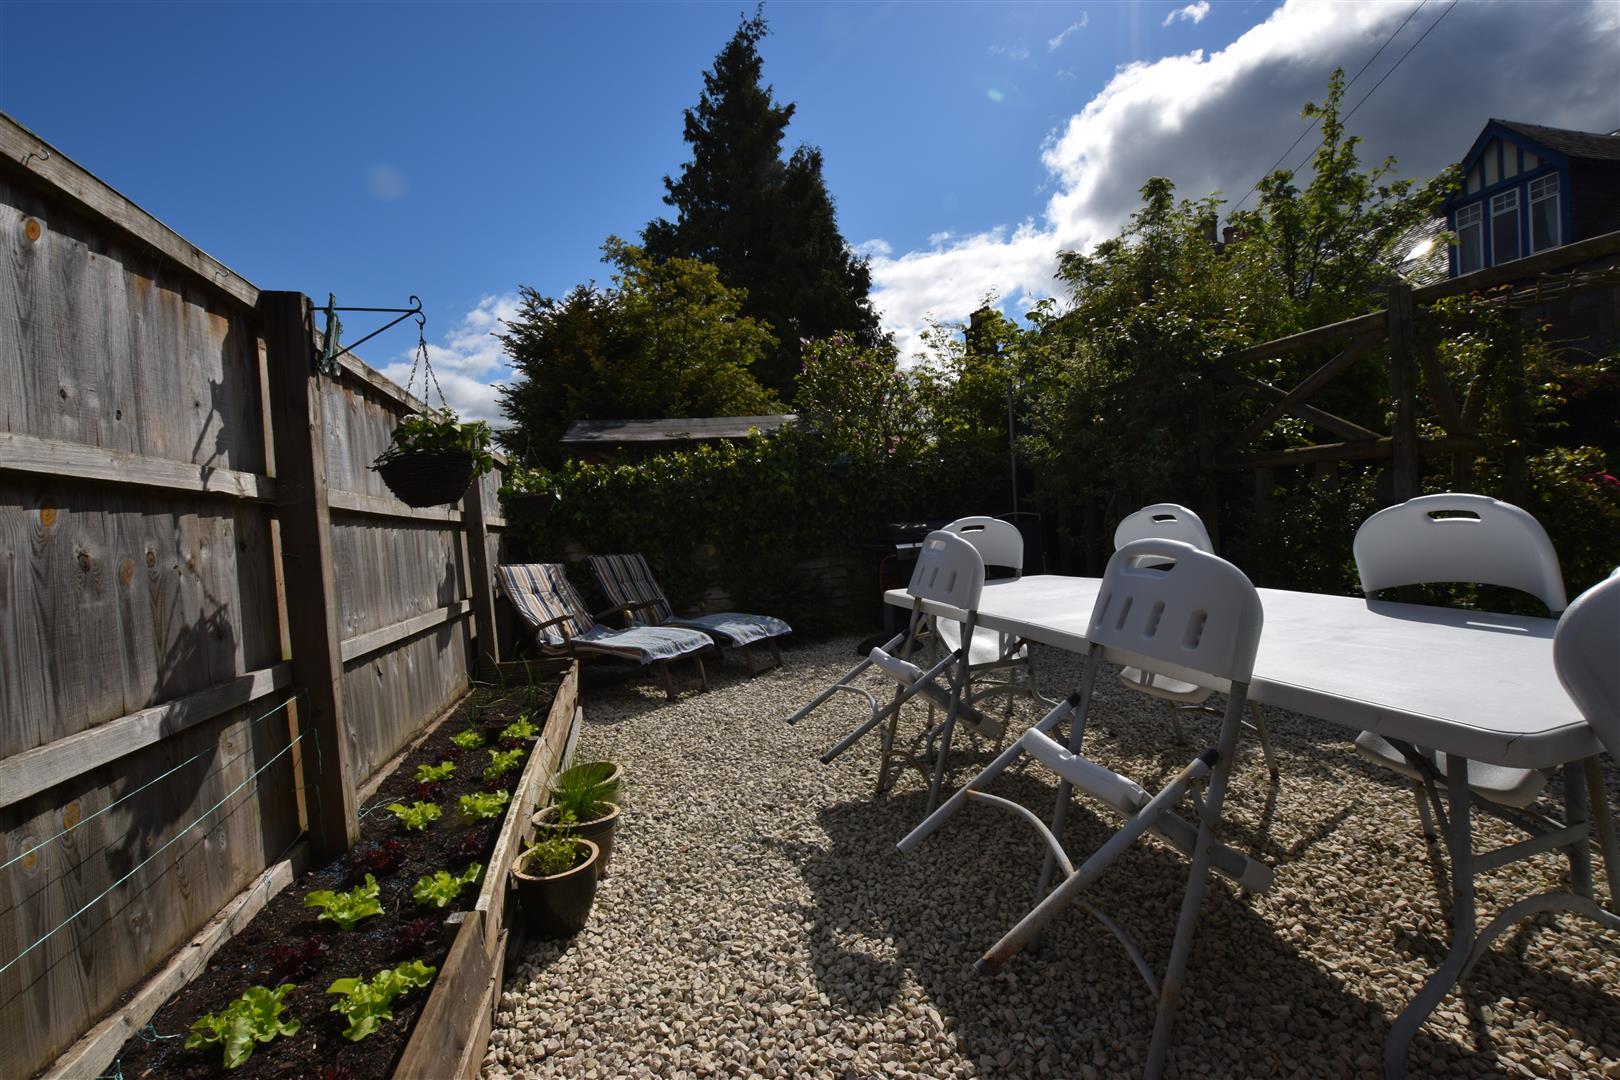 5, Moredun Terrace, Perth, Perthshire, PH2 0DA, UK